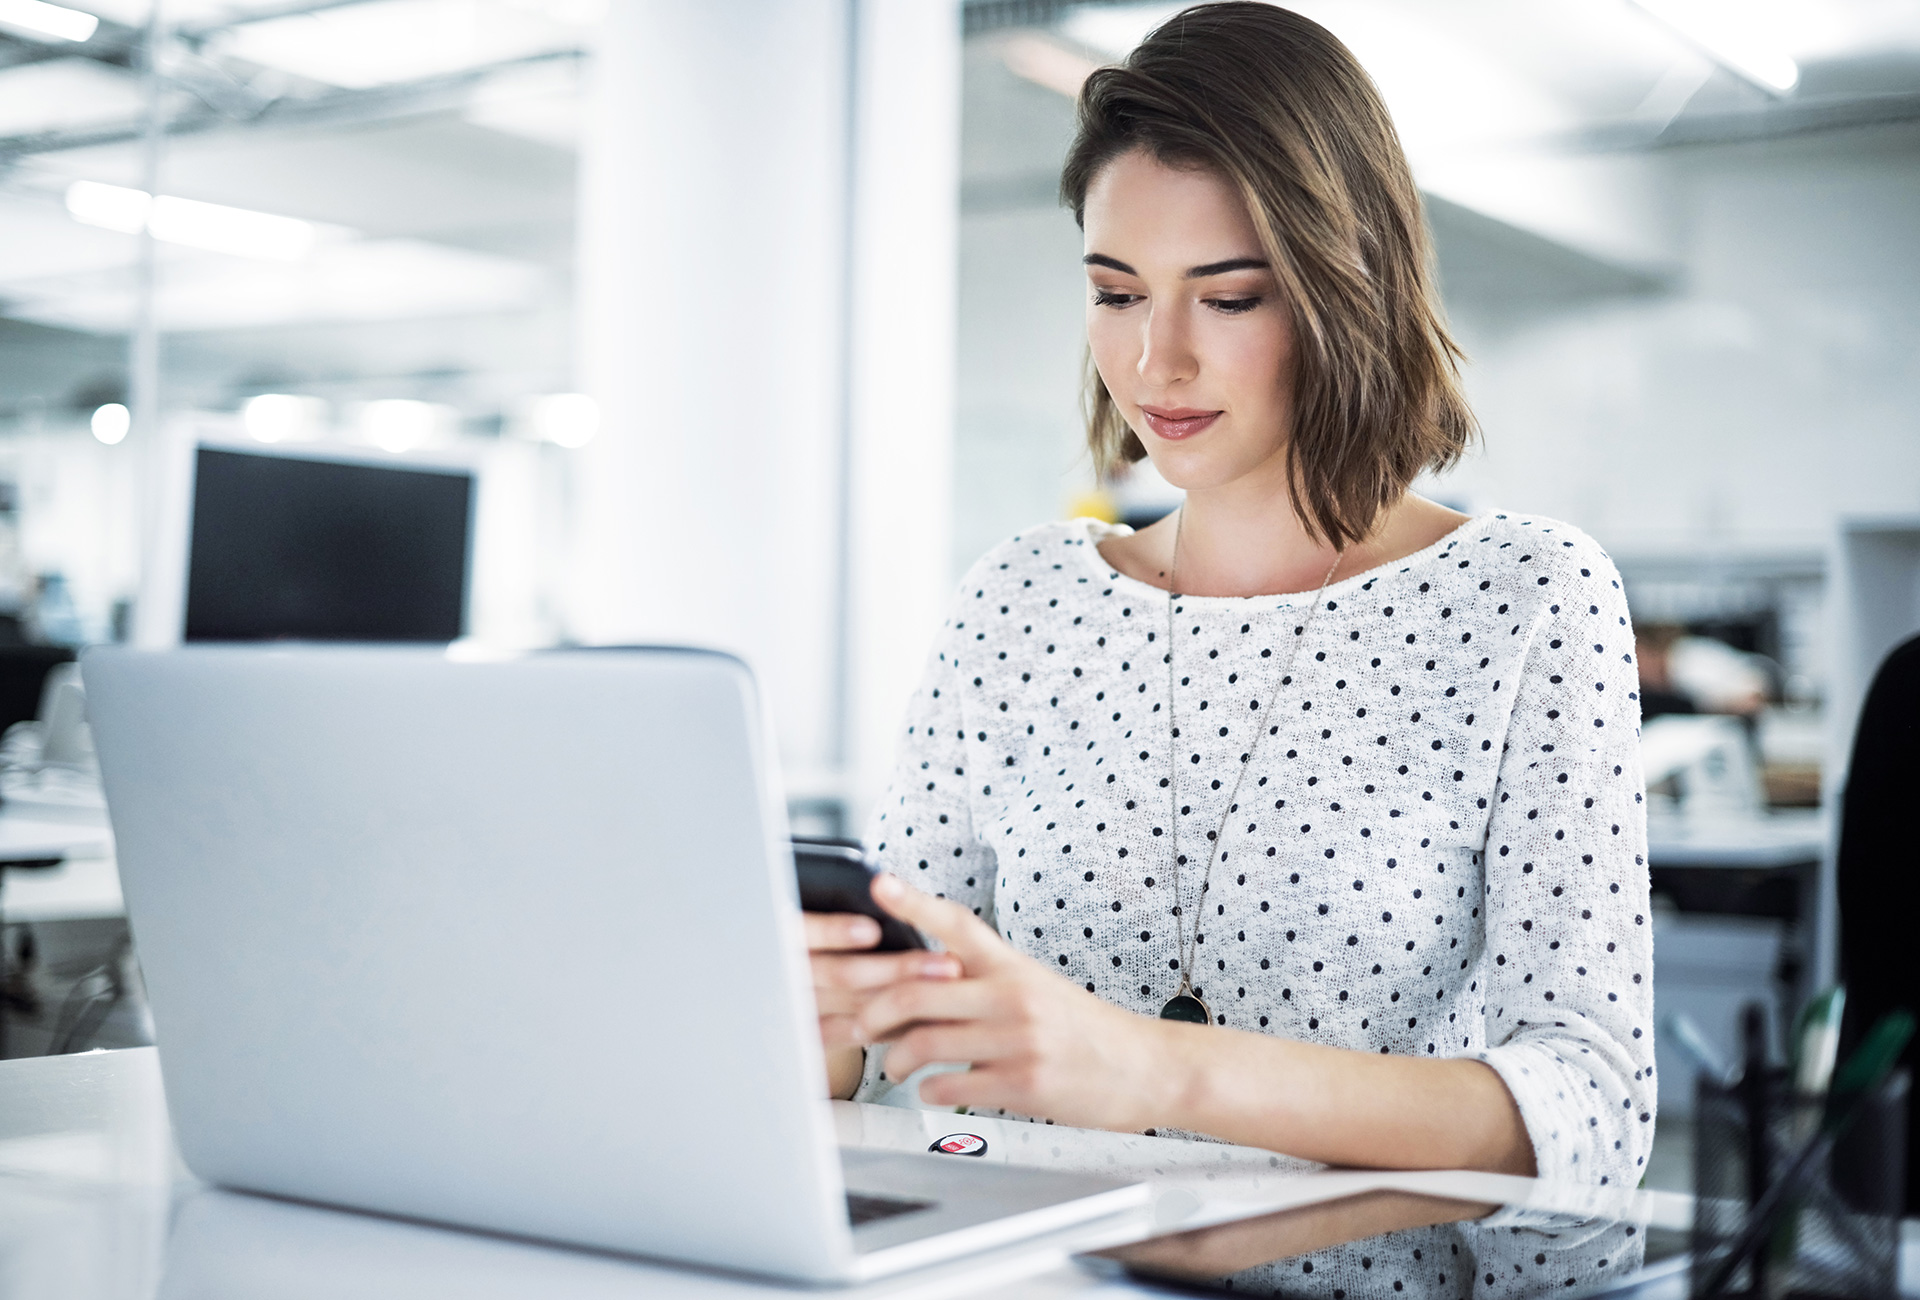 woman-programming-eniq-fob-with-smartphone